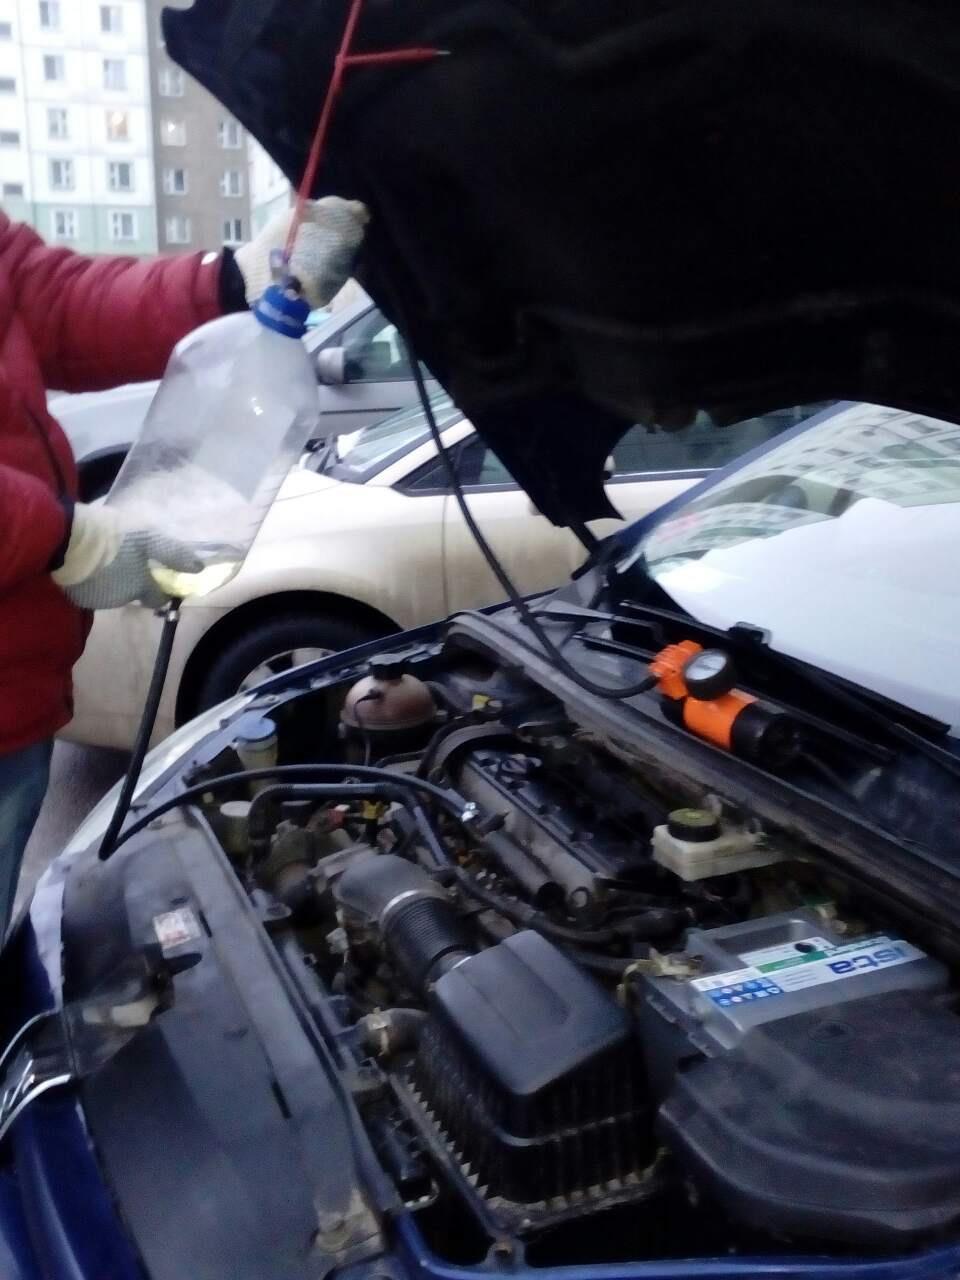 Ошибки Antipollution Fault и catalytic converter fault